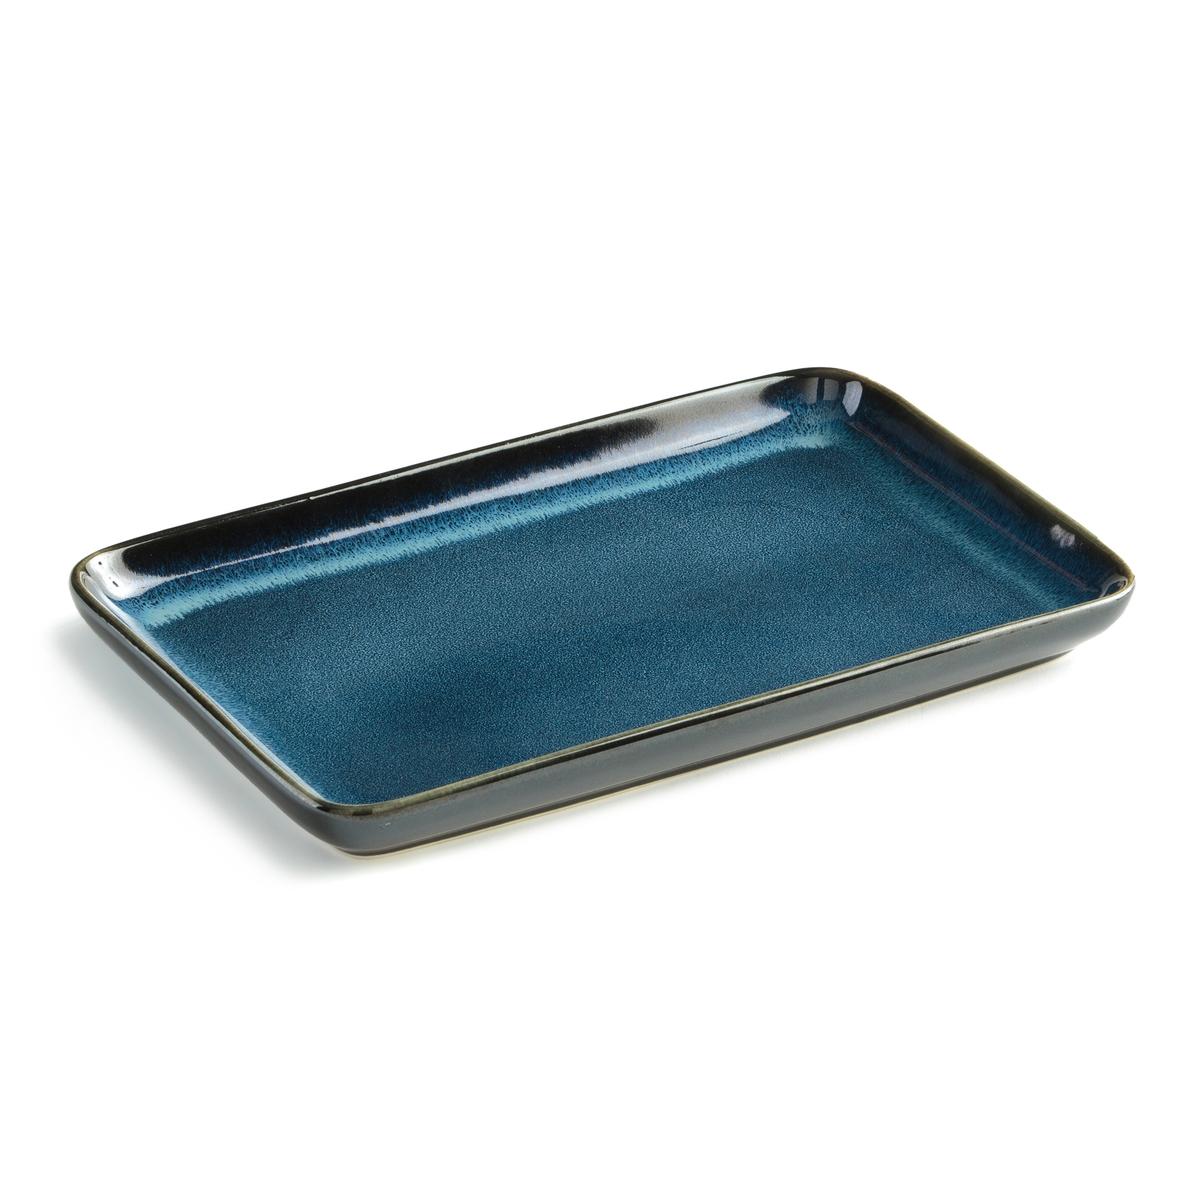 цена на Комплект из тарелок для La Redoute Суши Neta единый размер синий